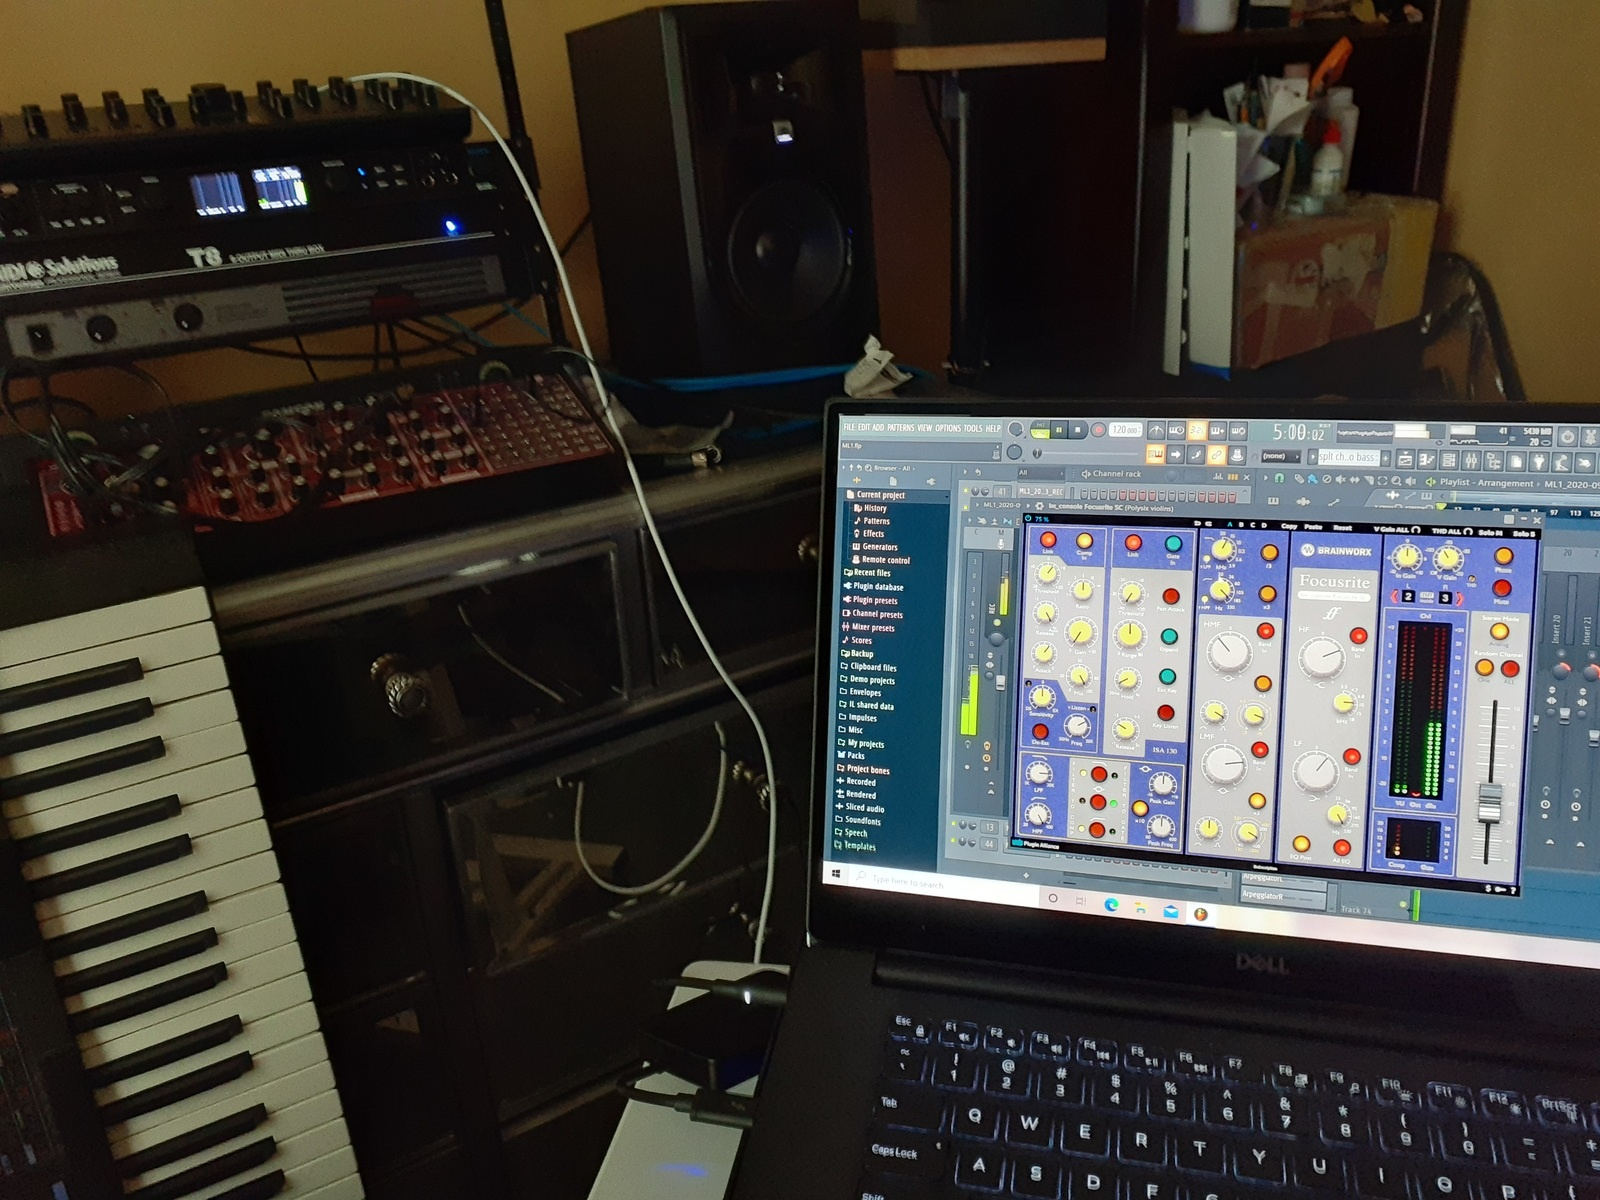 "jimmarchi1's music gear photo containing korg DW-6000, Behringer Neutron, MOTU 828es, Tannoy PBM 6.5, JBL 306P MKII Powered 6.5"" Two-Way Studio Monitors, Brainworx bx_console Focusrite SC, Image-Line FL Studio 20 Producer Edition, Modal Electronics Modal Argon8M, and Dell XPS 7590"